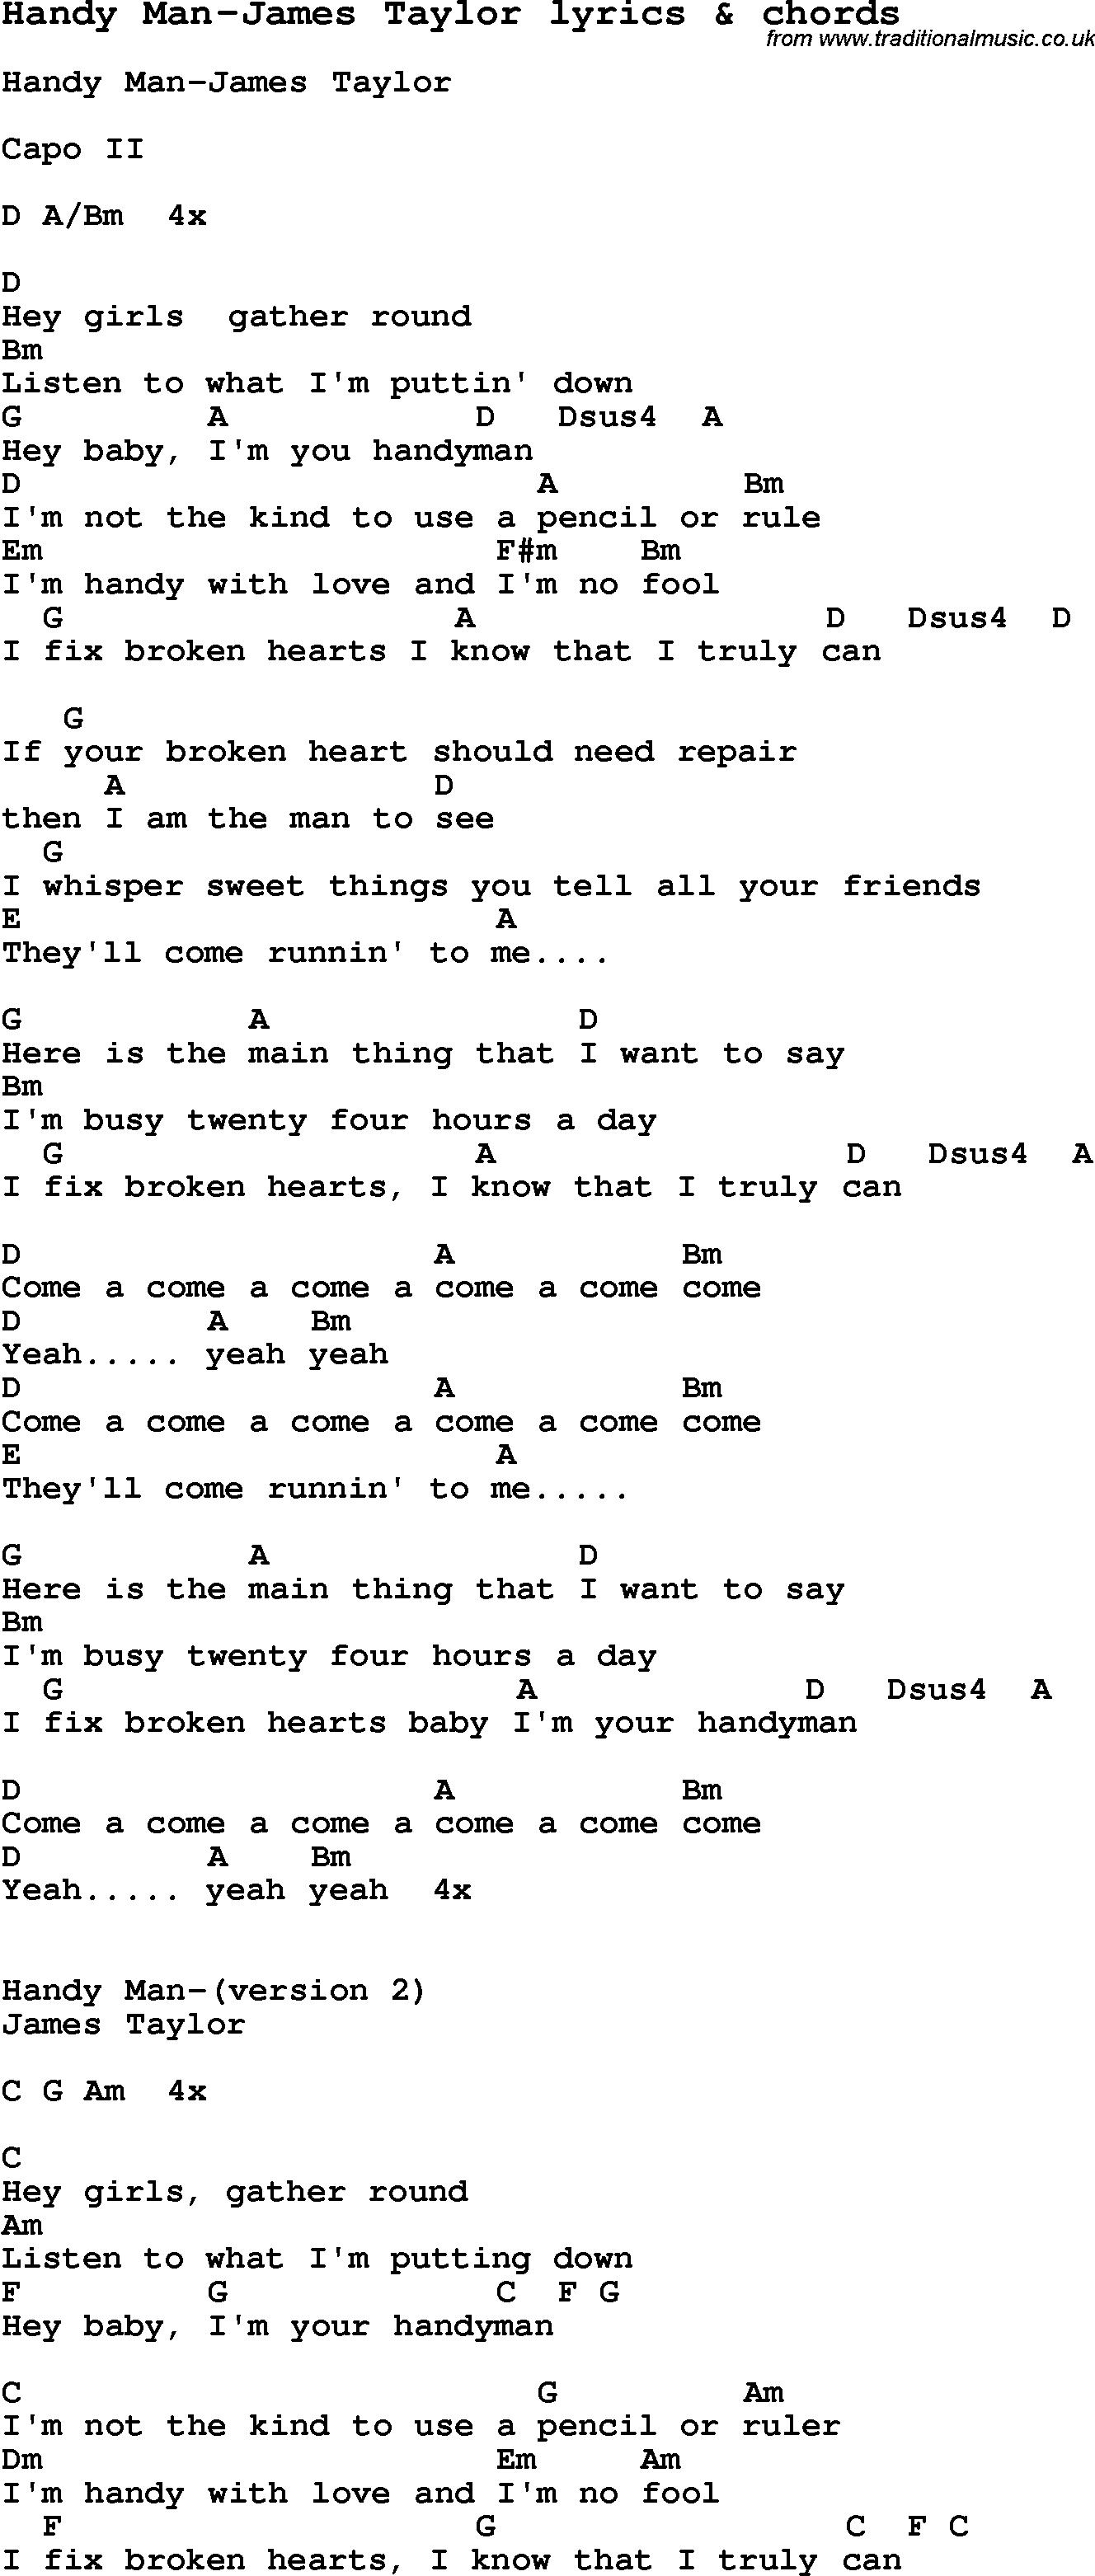 Love song lyrics for handy man james taylor with chords for love song lyrics for handy man james taylor with chords for ukulele guitar hexwebz Gallery